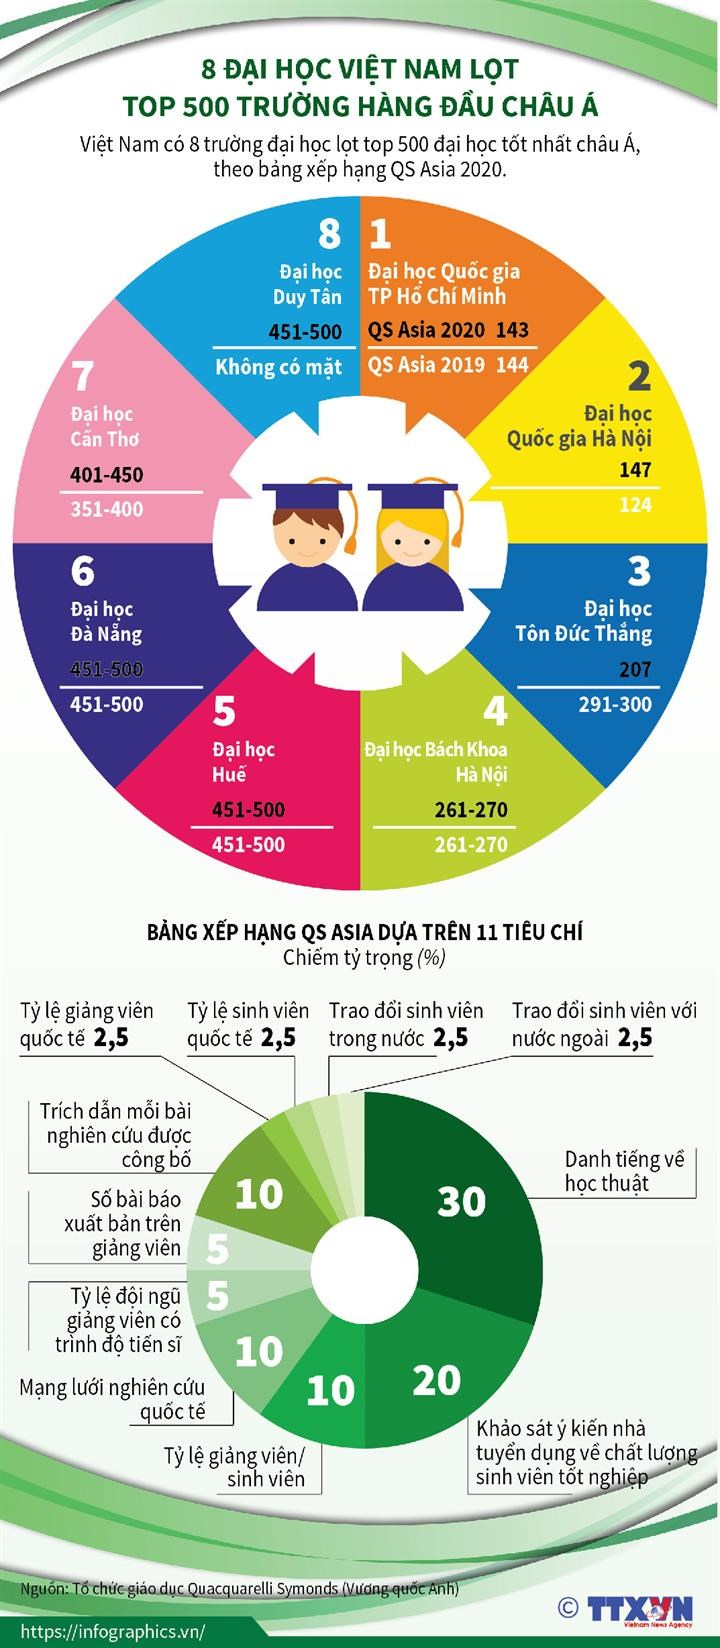 [Infographics] 8 dai hoc Viet Nam lot top 500 truong hang dau chau A hinh anh 1